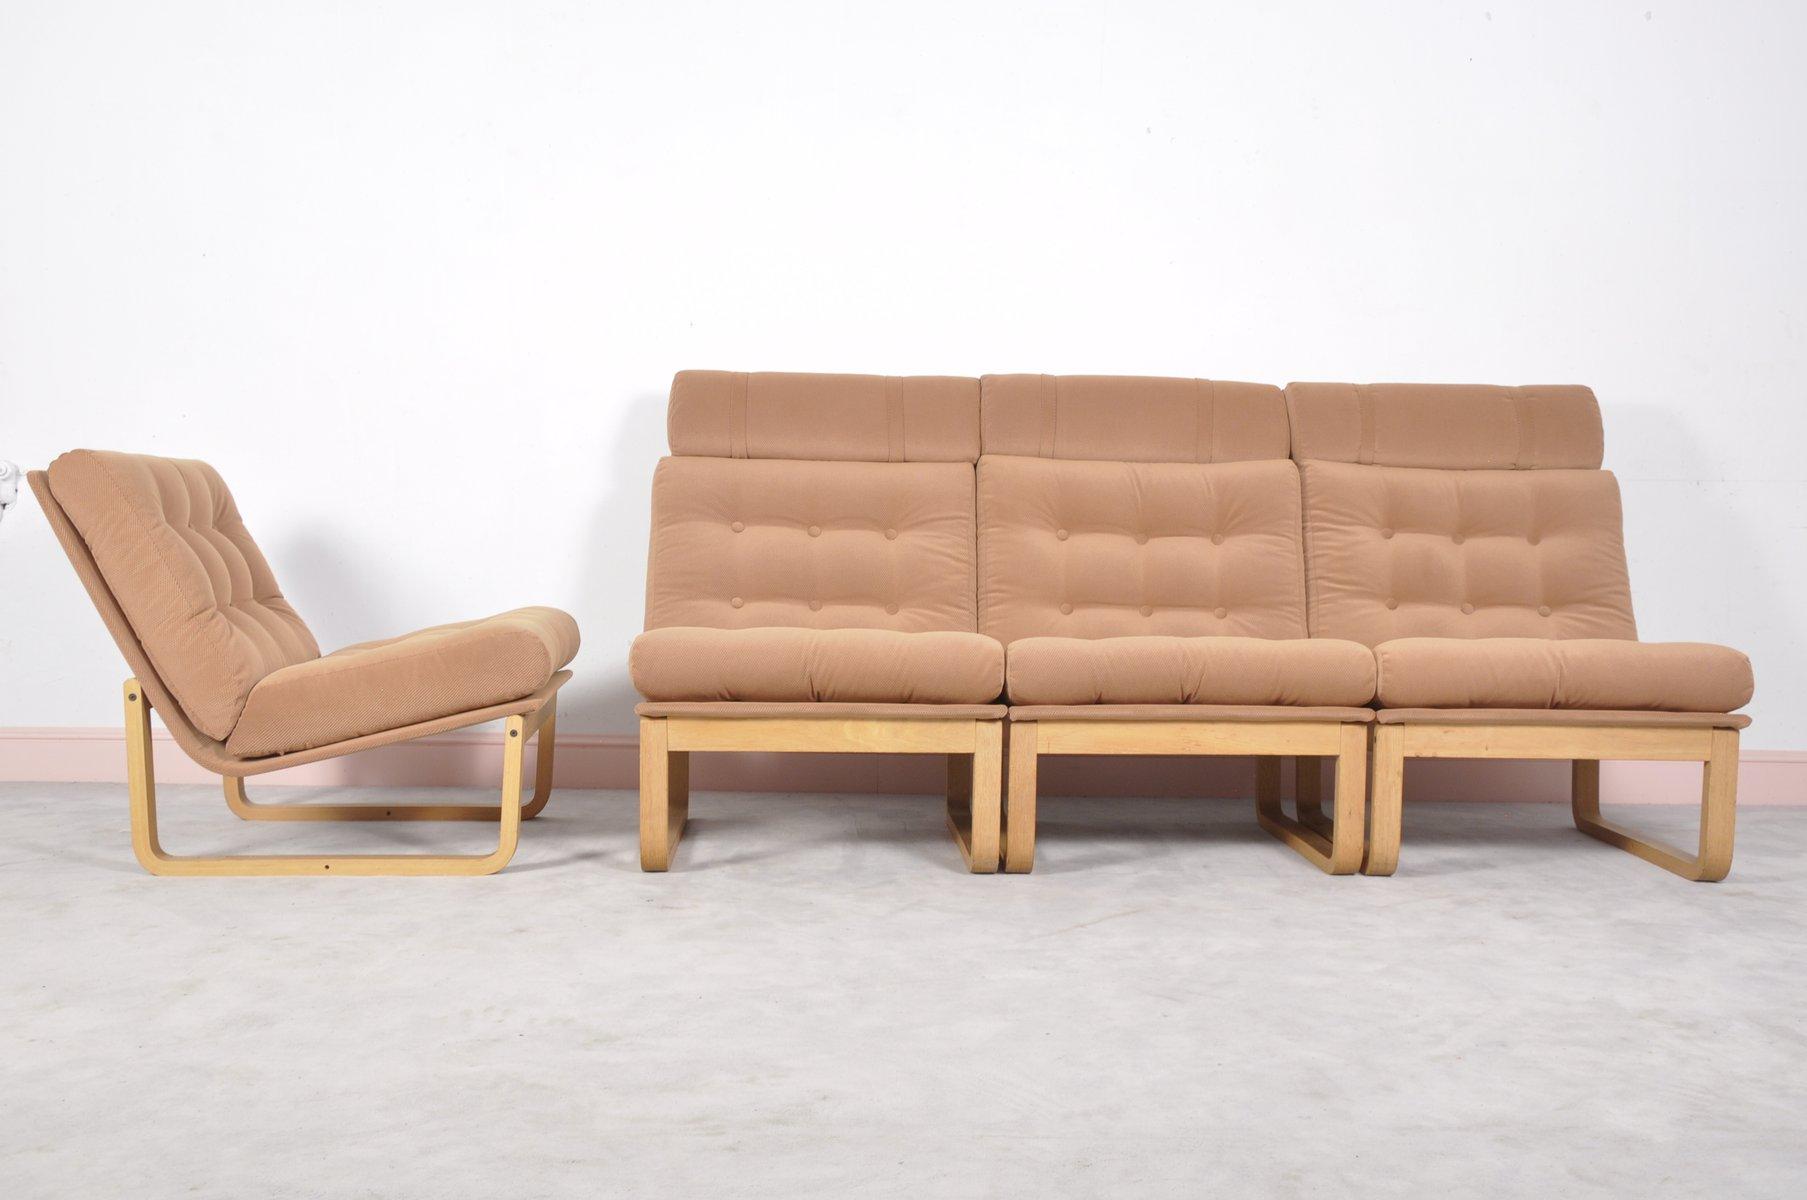 Mid Century Sectional Sofa by Rud Thygesen & Johnny Sorensen for